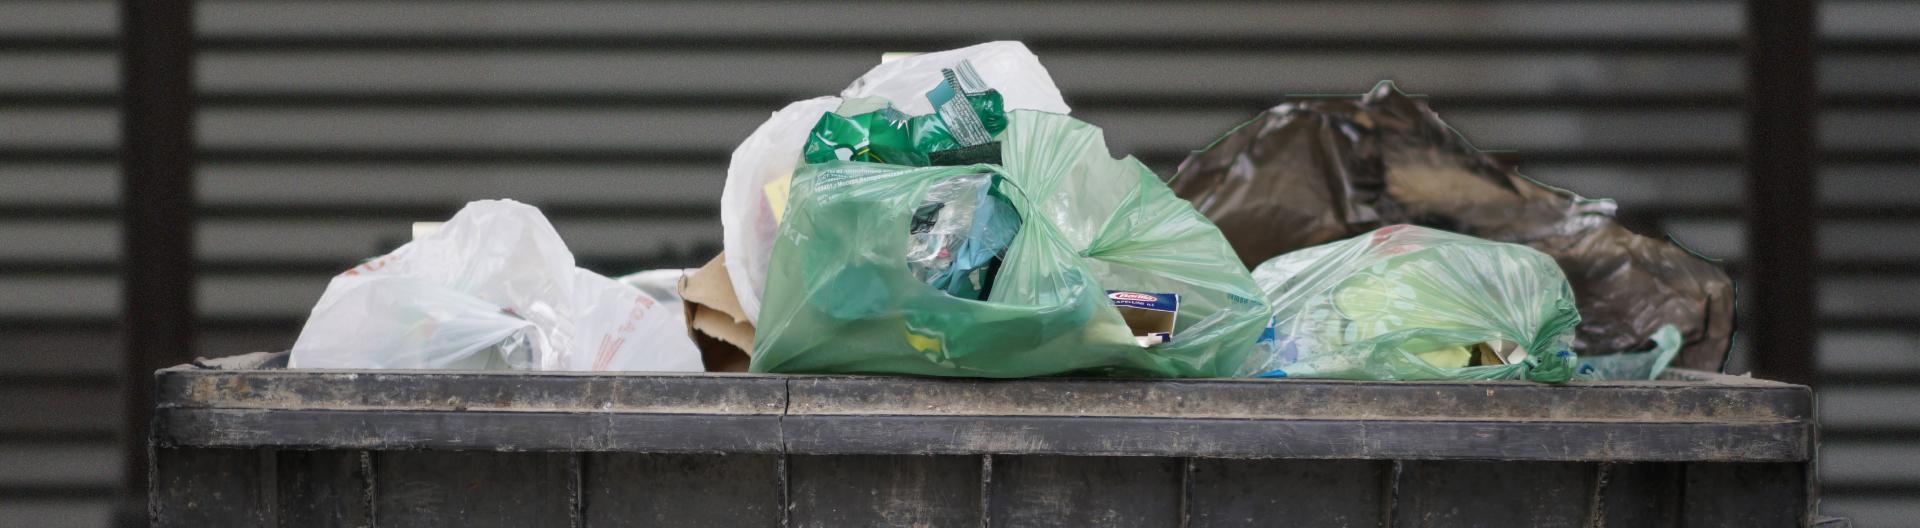 Do Bin Rentals Include Disposal?